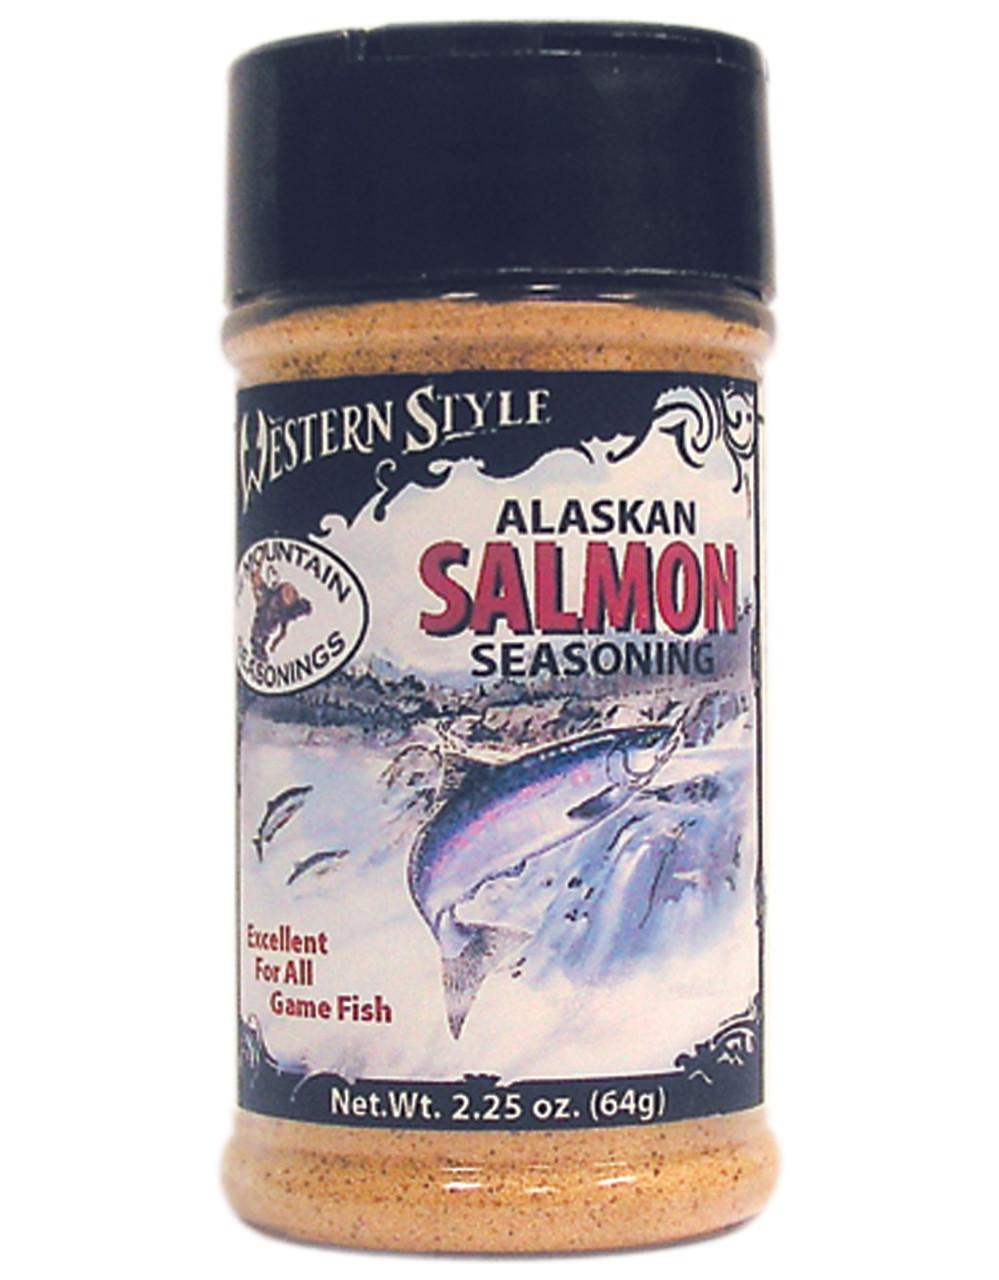 Alaskan Salmon Western Style Seasoning